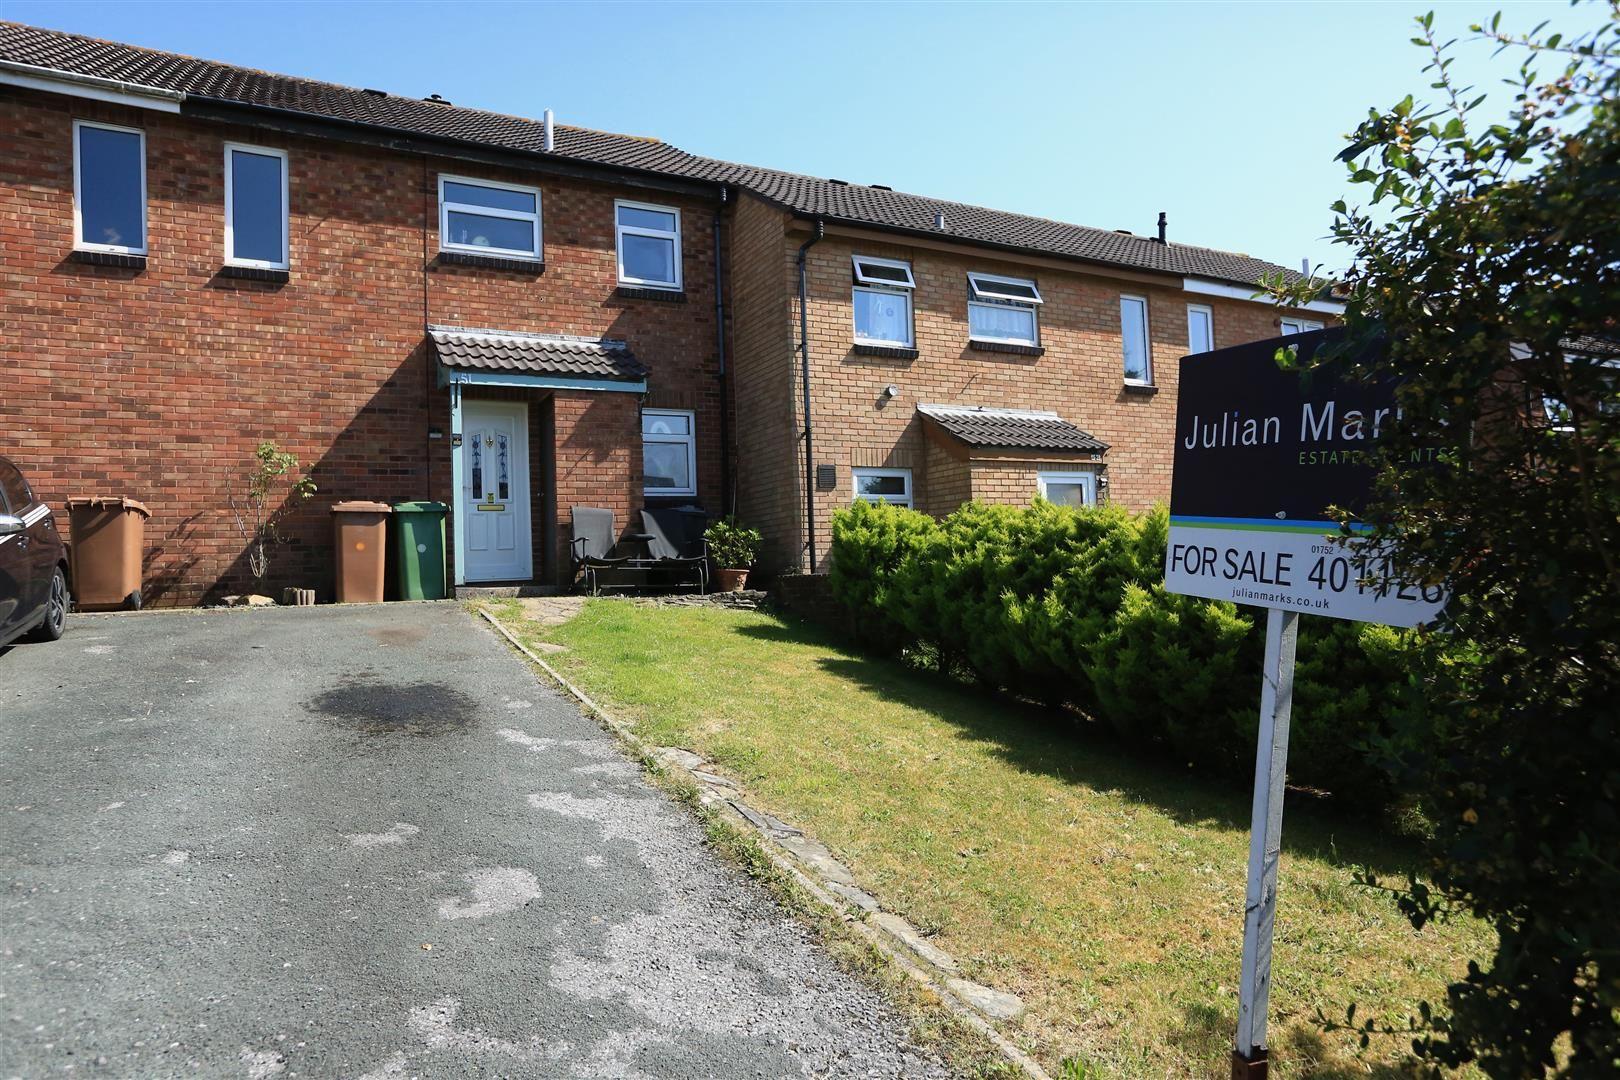 Property photo 1 of 10. Ab2A2242.Jpeg